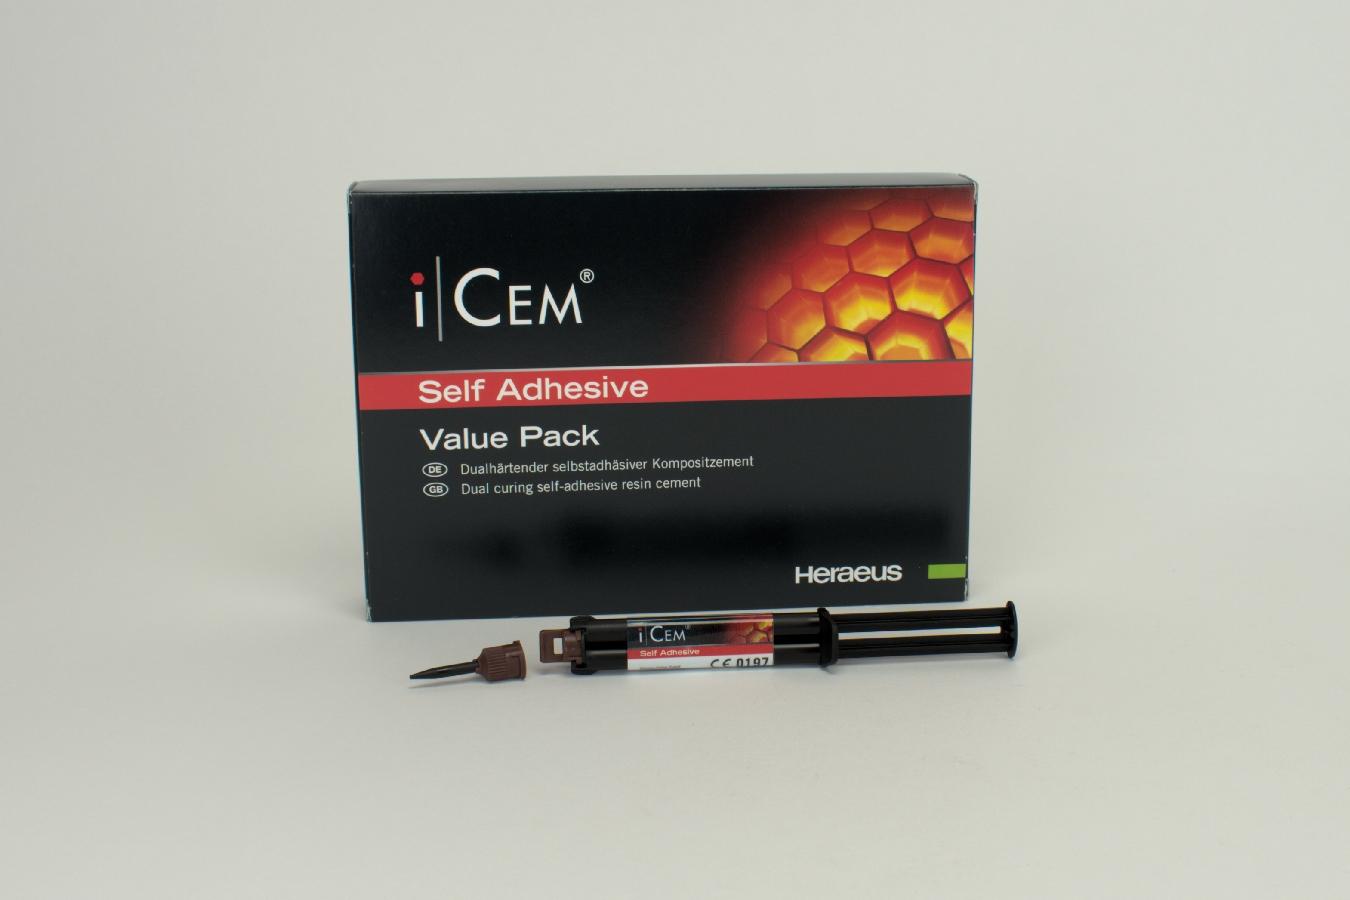 iCEM Self Adhesive 3x7g Spr Value Pa